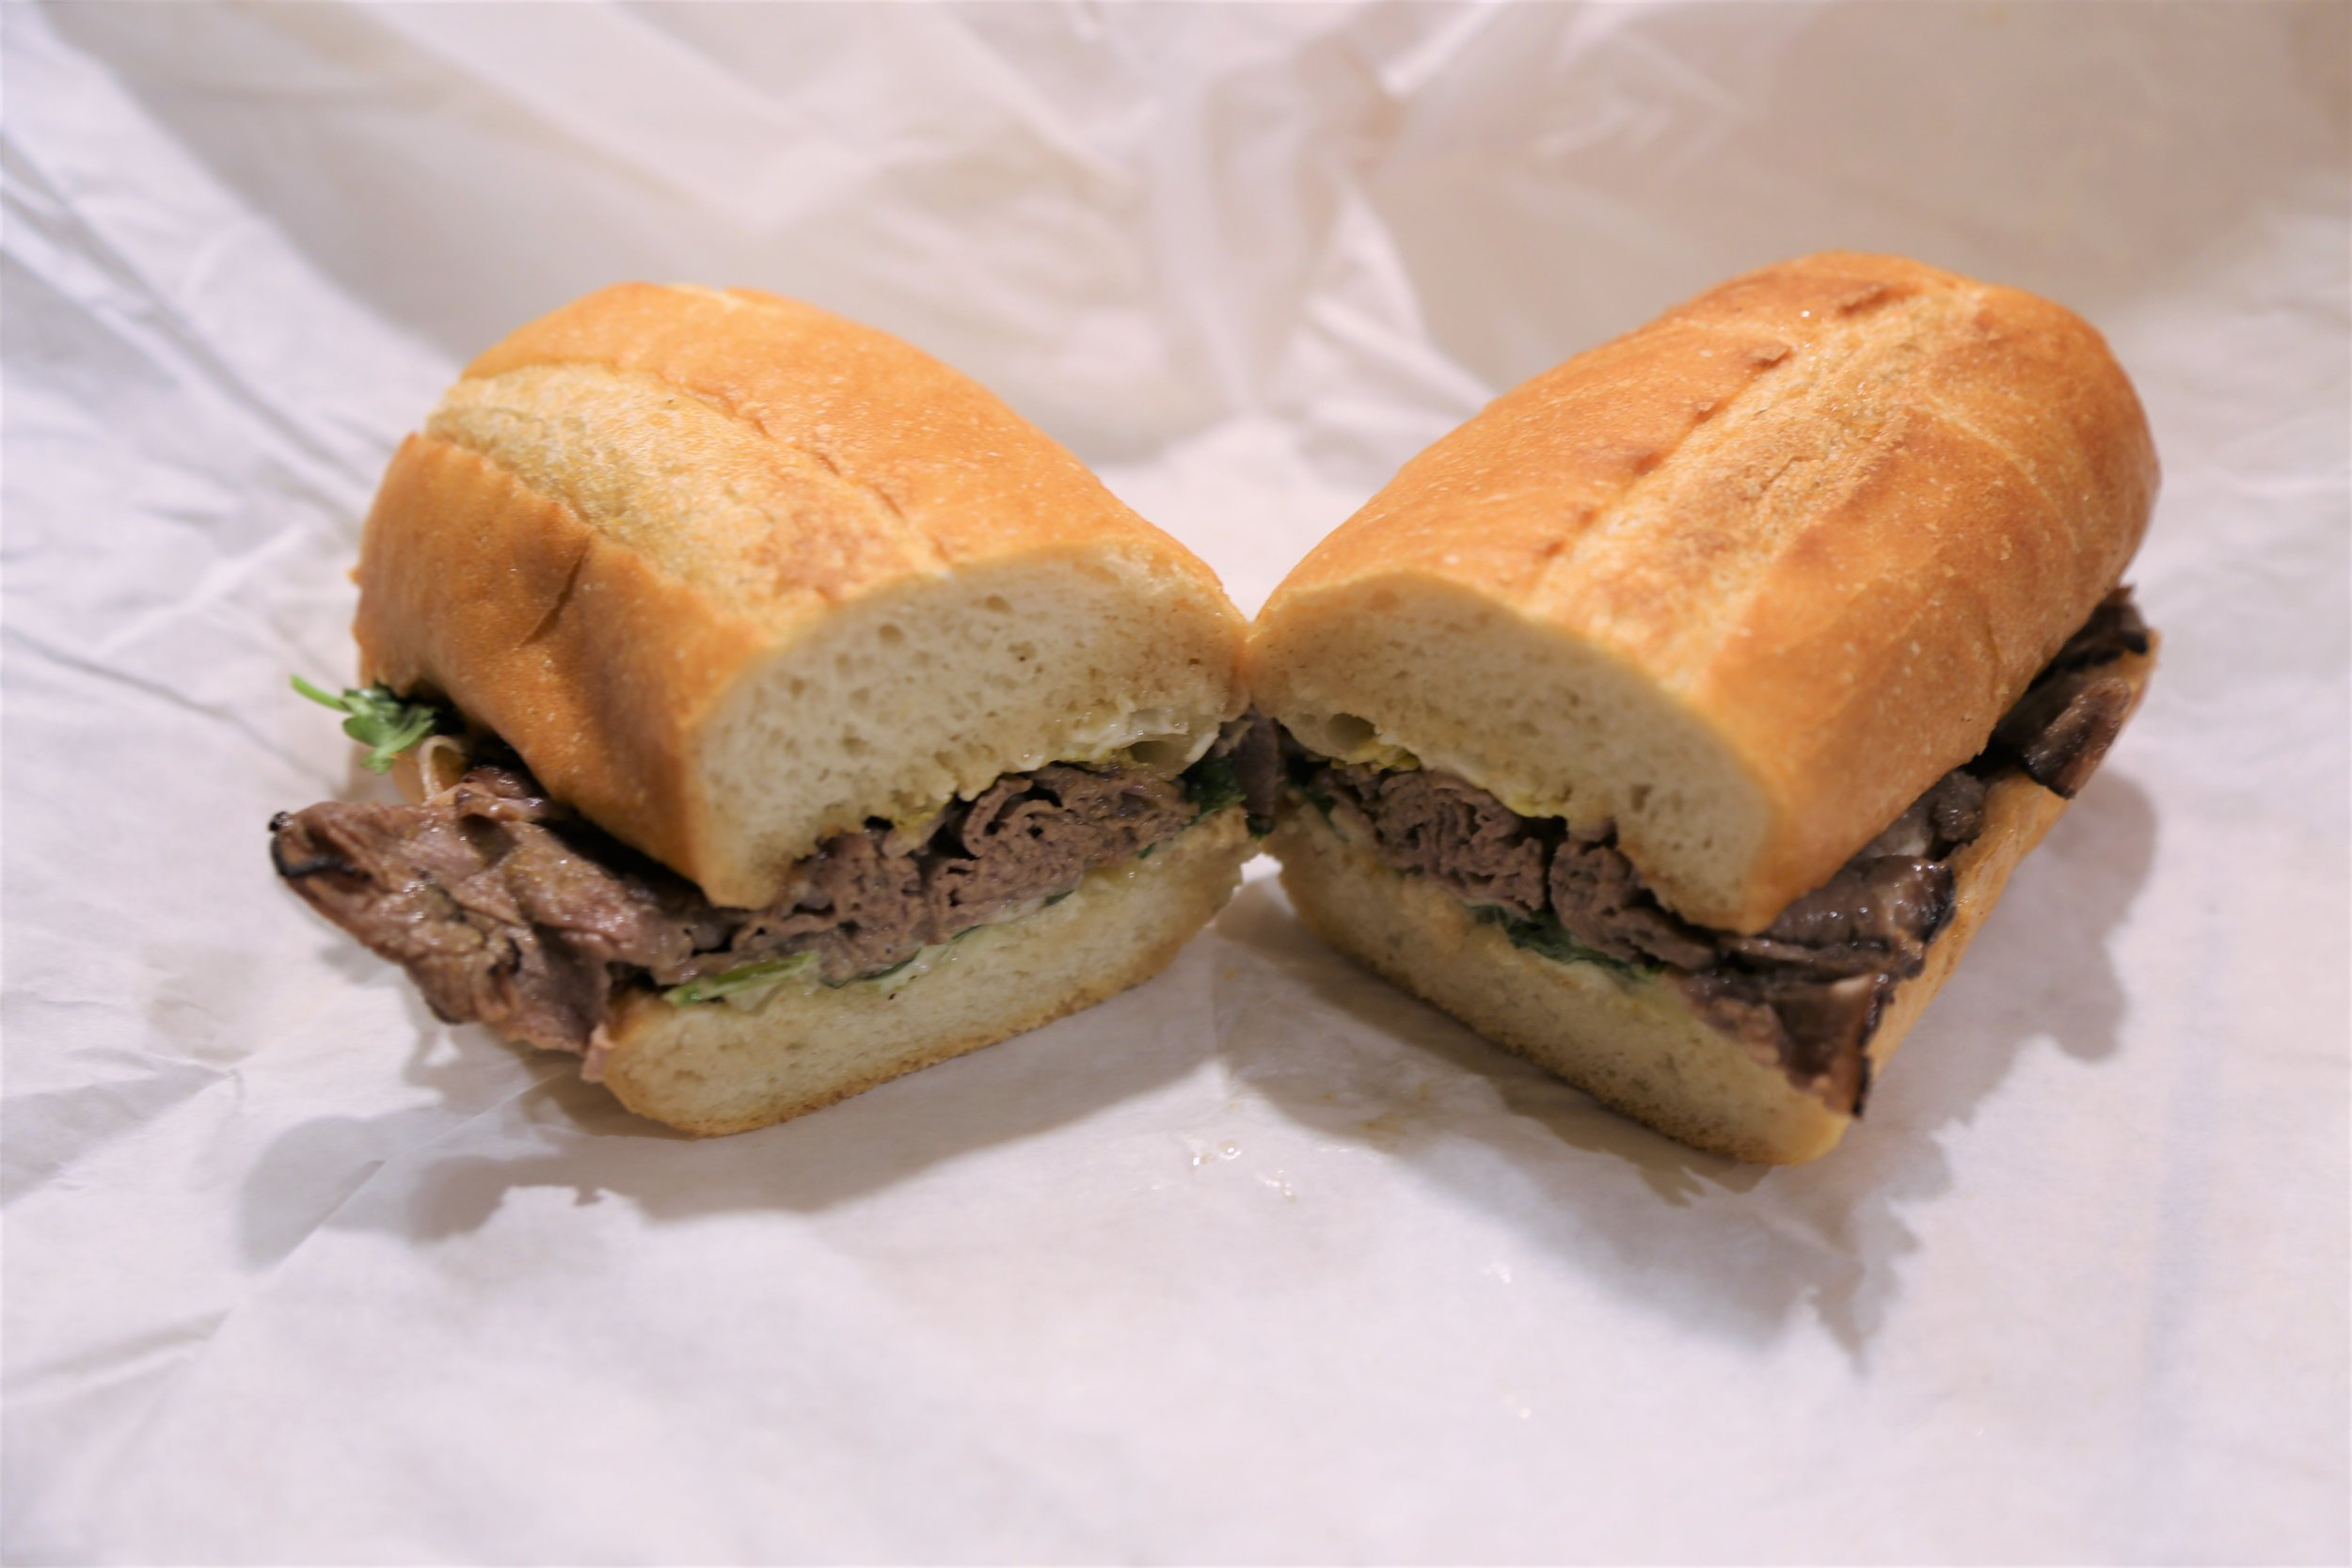 Carribean Pork sandwich